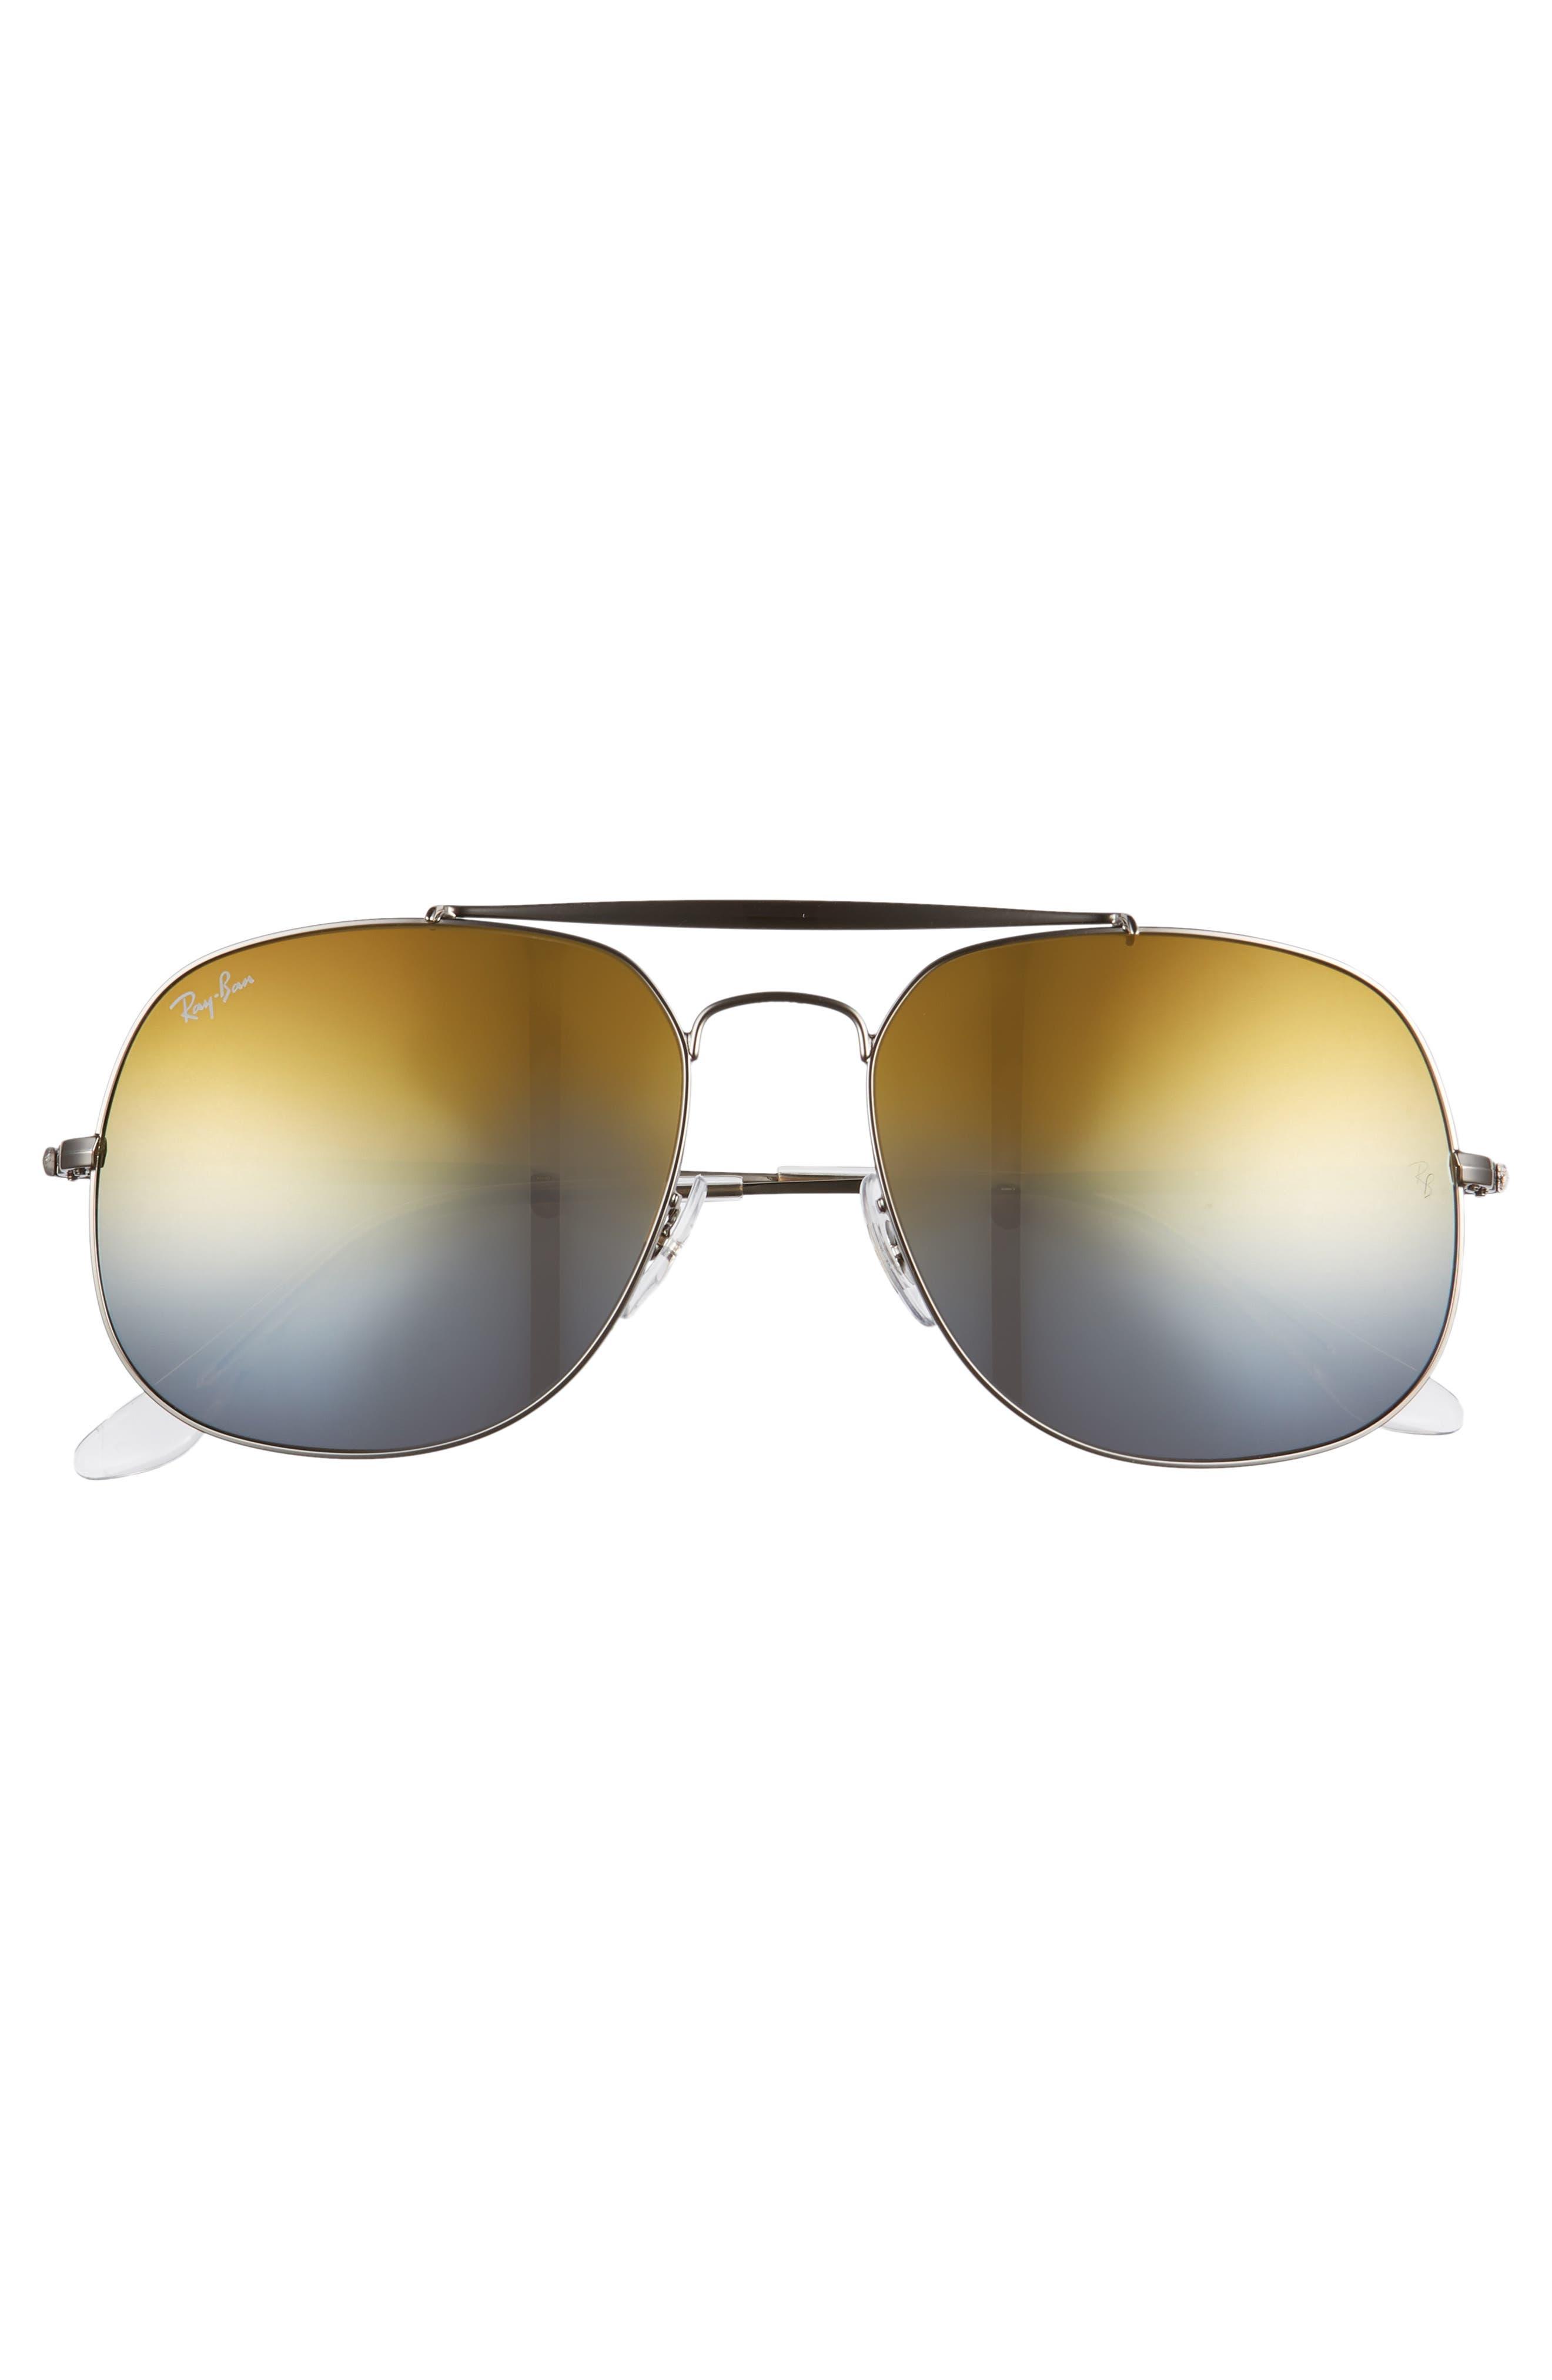 57mm Aviator Sunglasses,                             Alternate thumbnail 3, color,                             Grey Orange